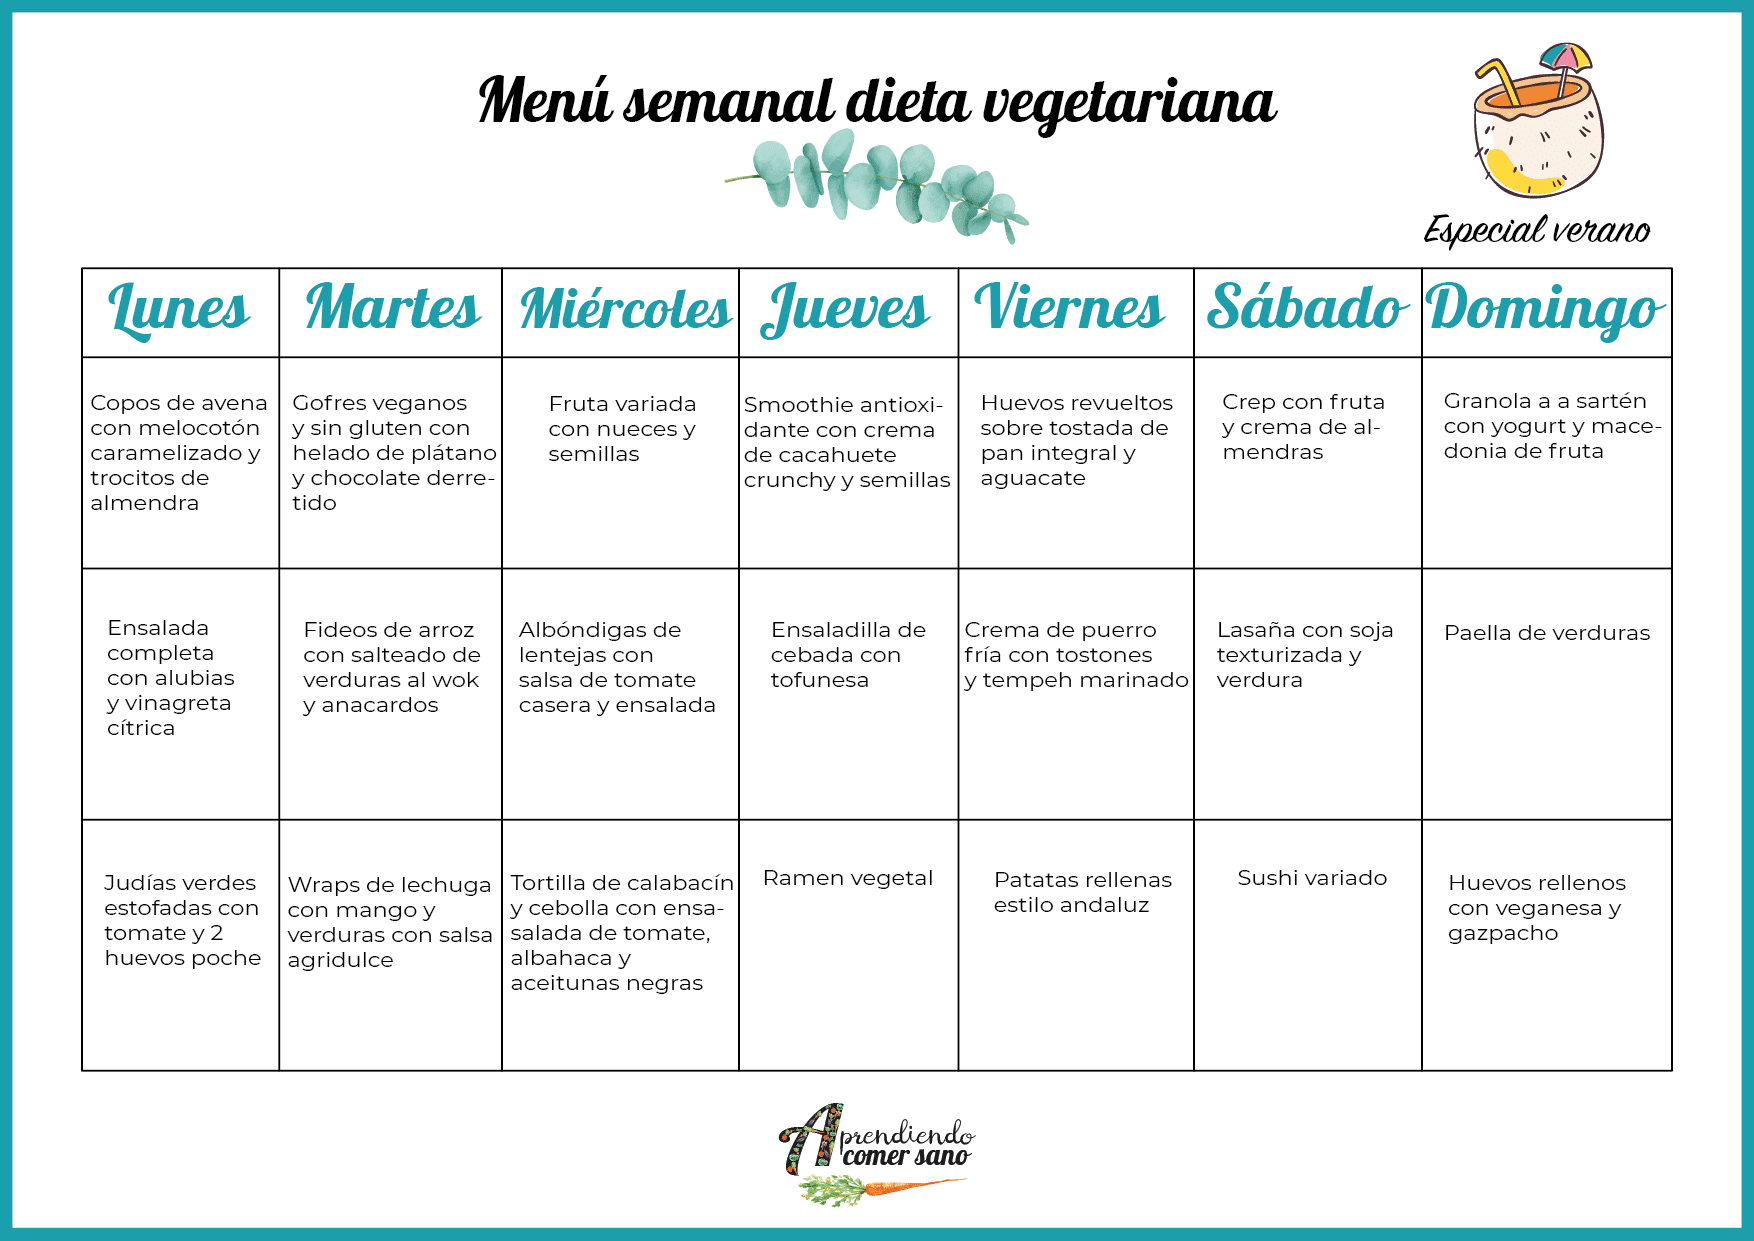 menu semanal dieta vegetariana verano